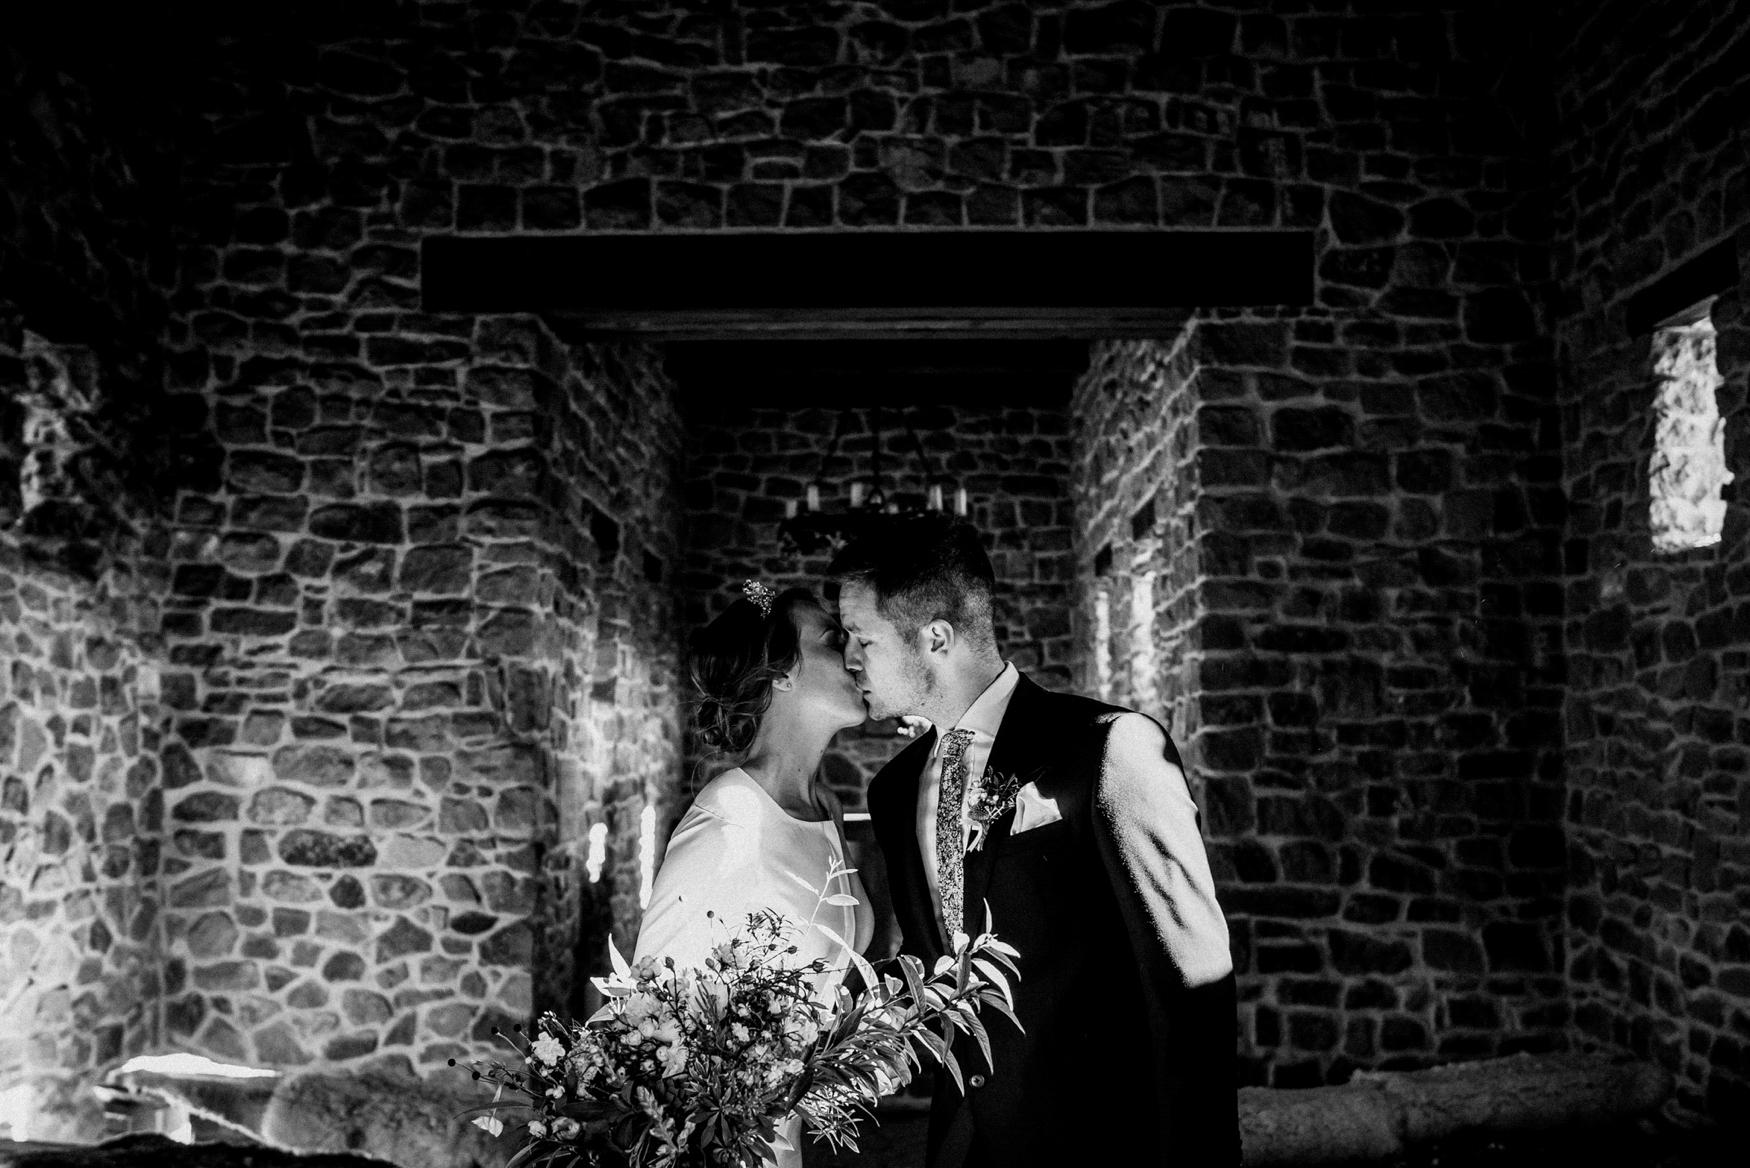 2 prague wedding photographer - boho svatba zikmundov028.jpg